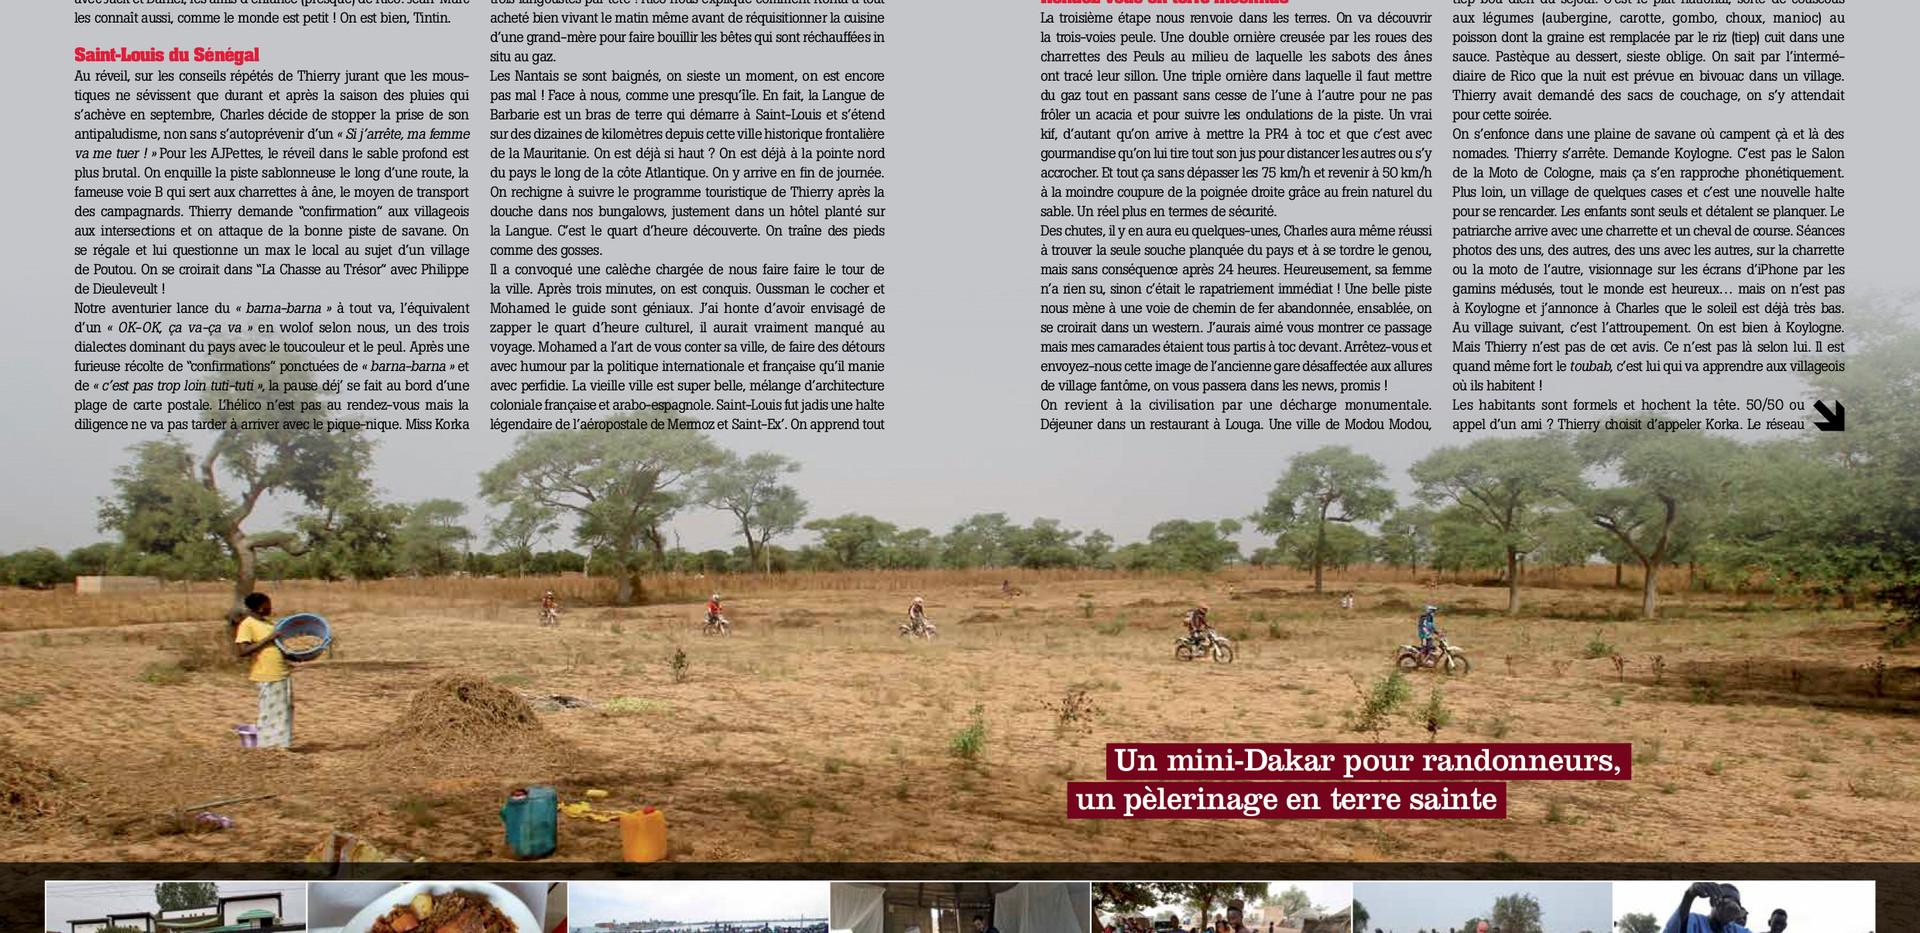 Rando Senegal5.jpg